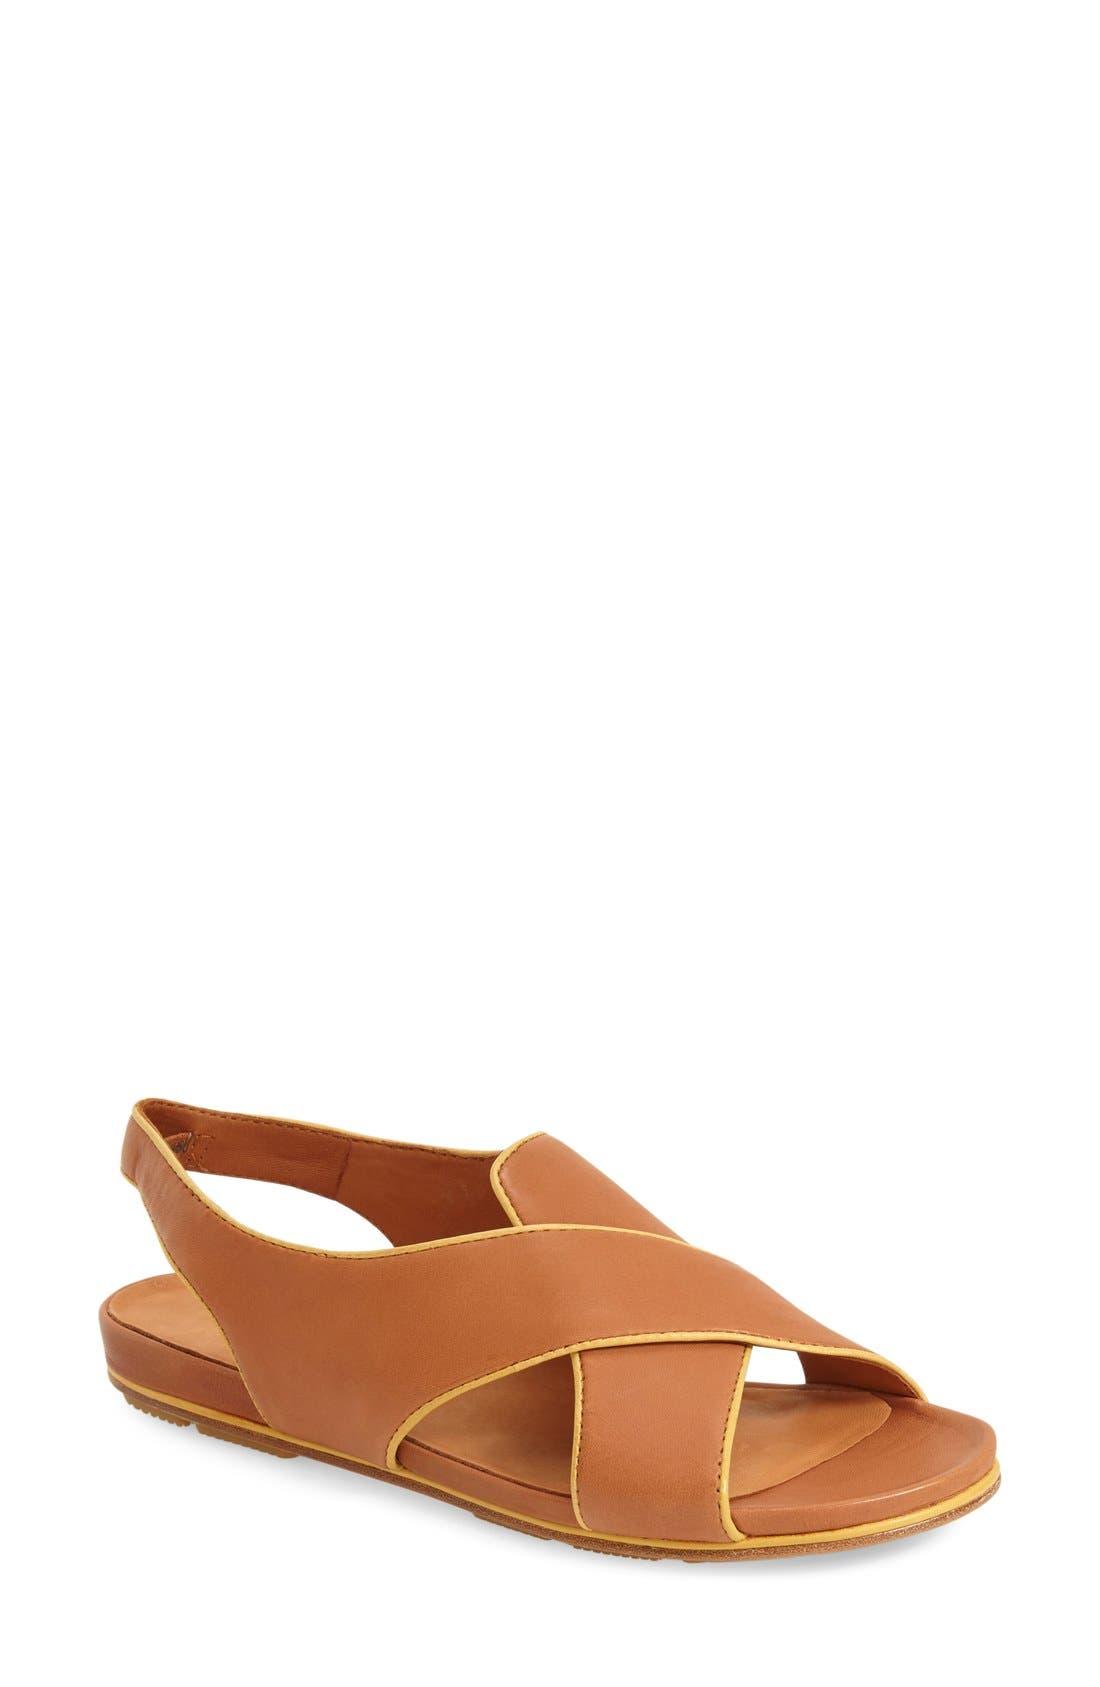 'Dallon' Crisscross Flat Sandal,                             Main thumbnail 1, color,                             Cognac Leather